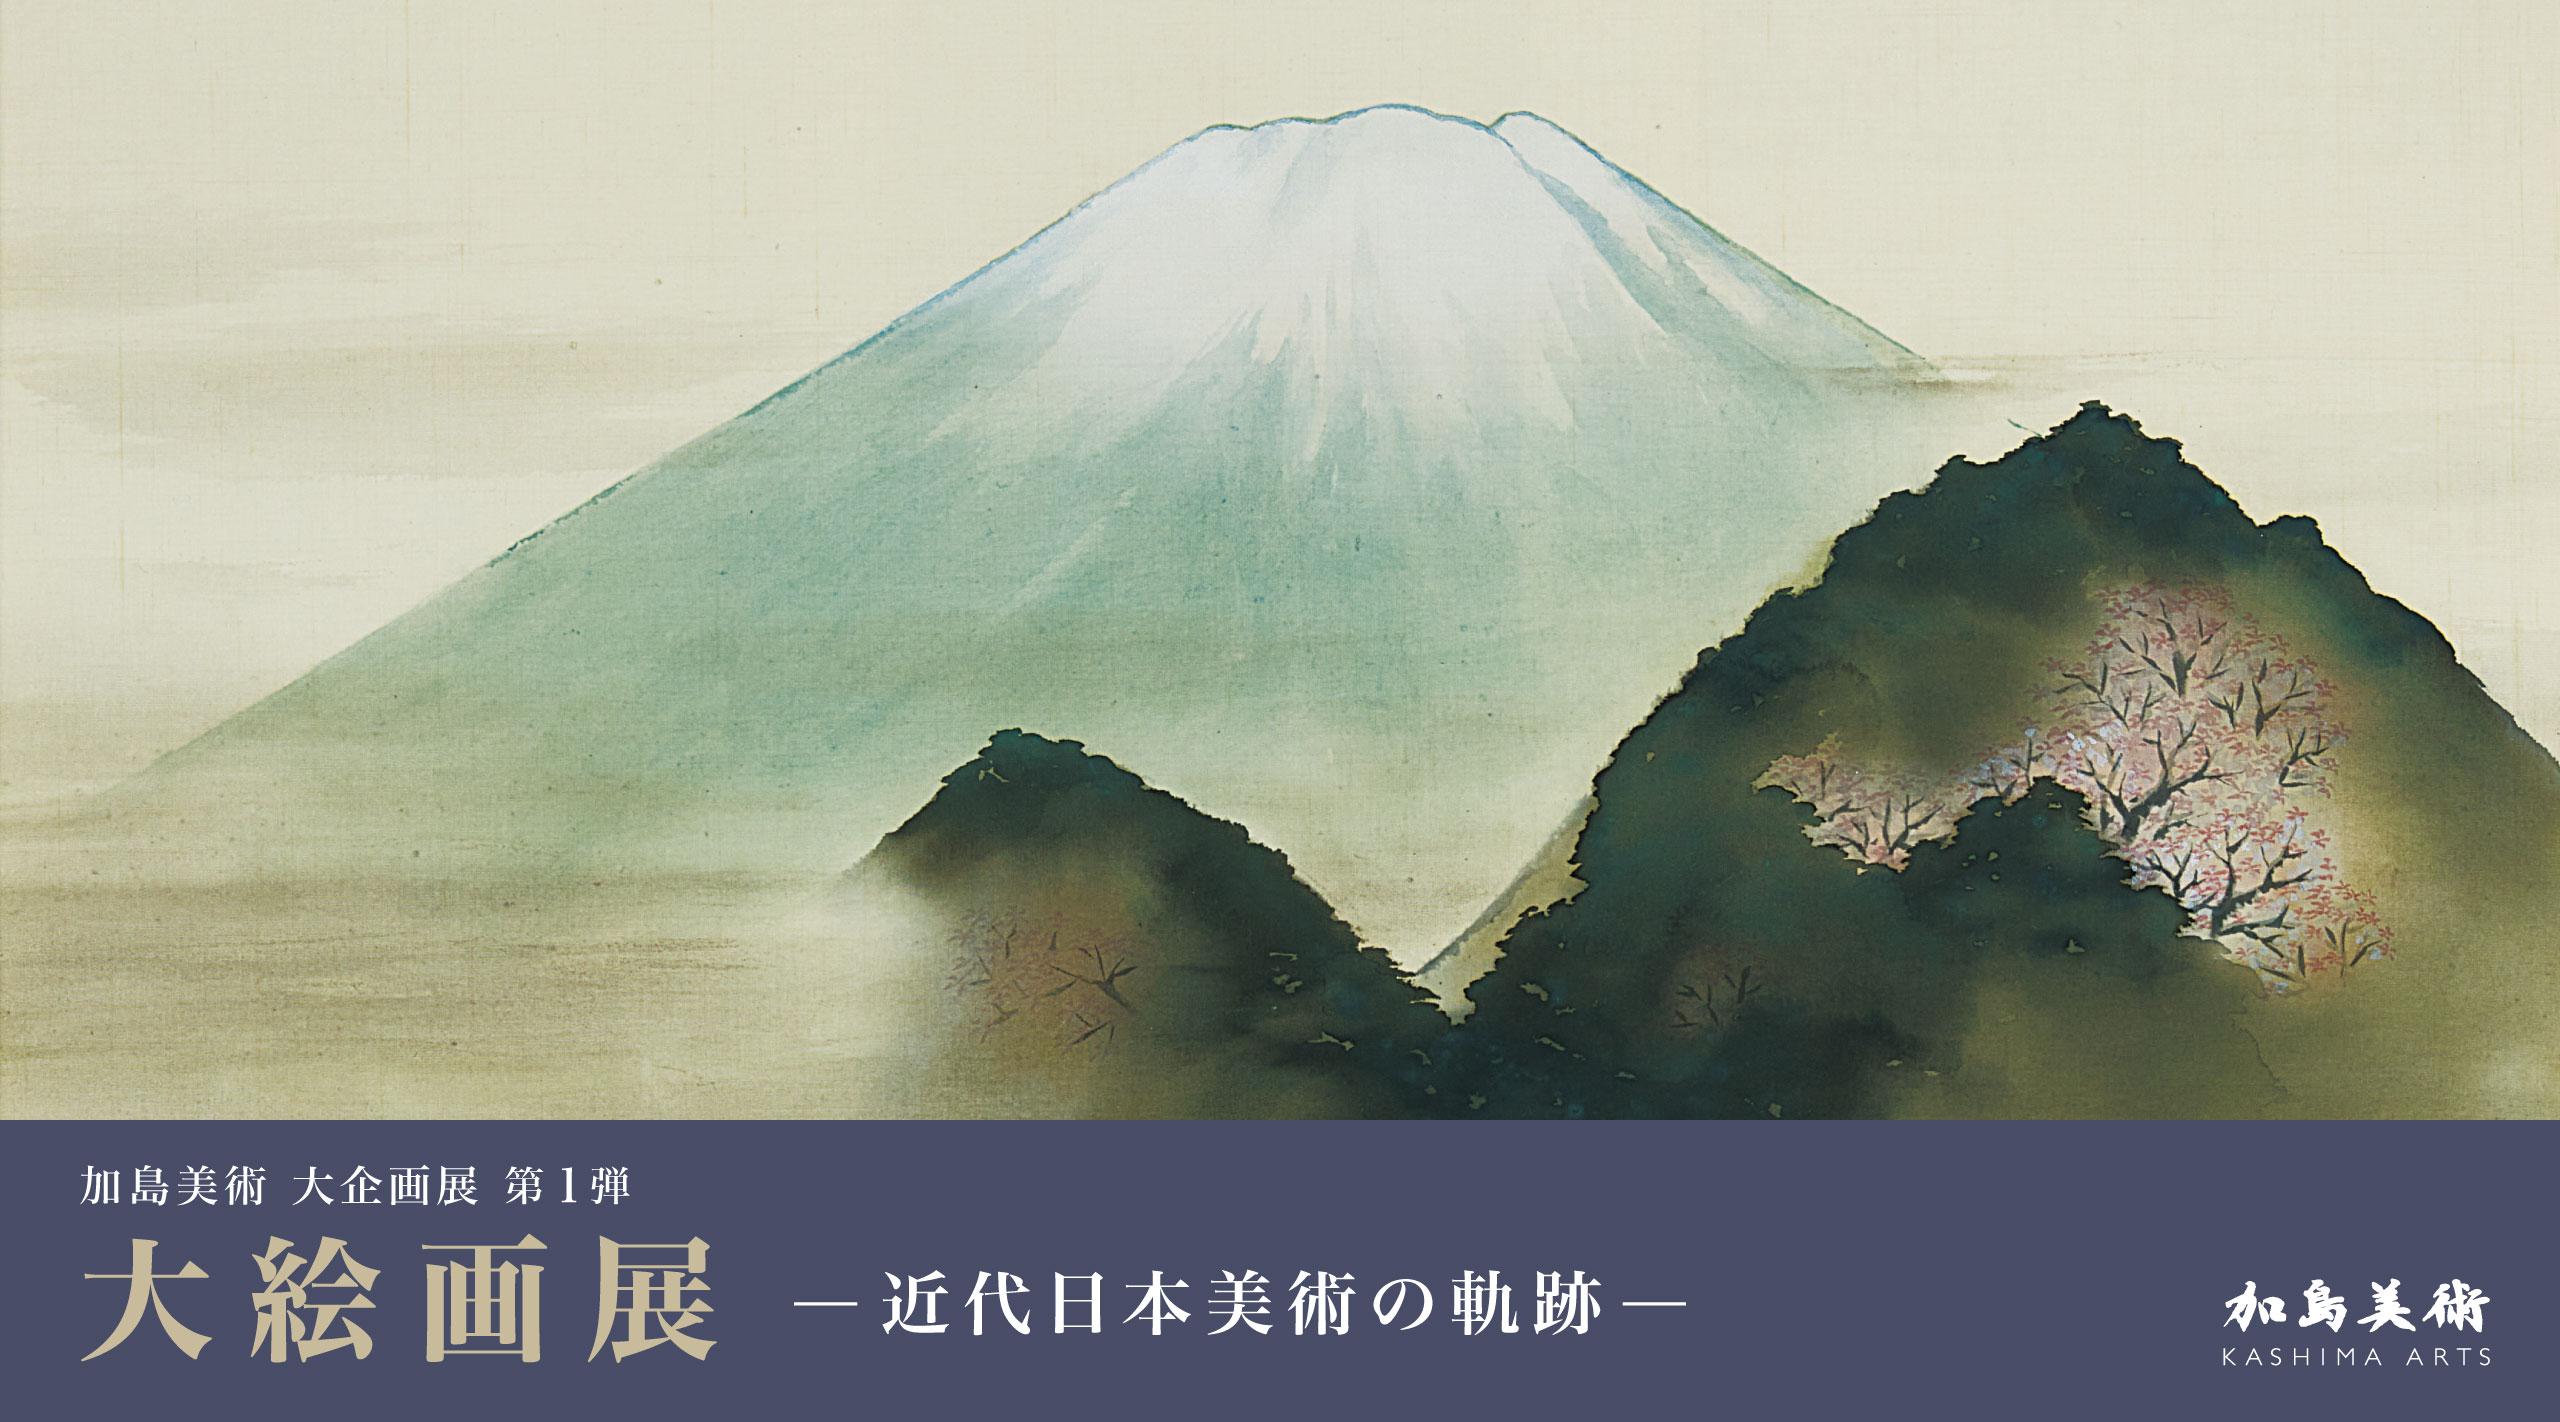 大絵画展ー近代日本美術の軌跡ー